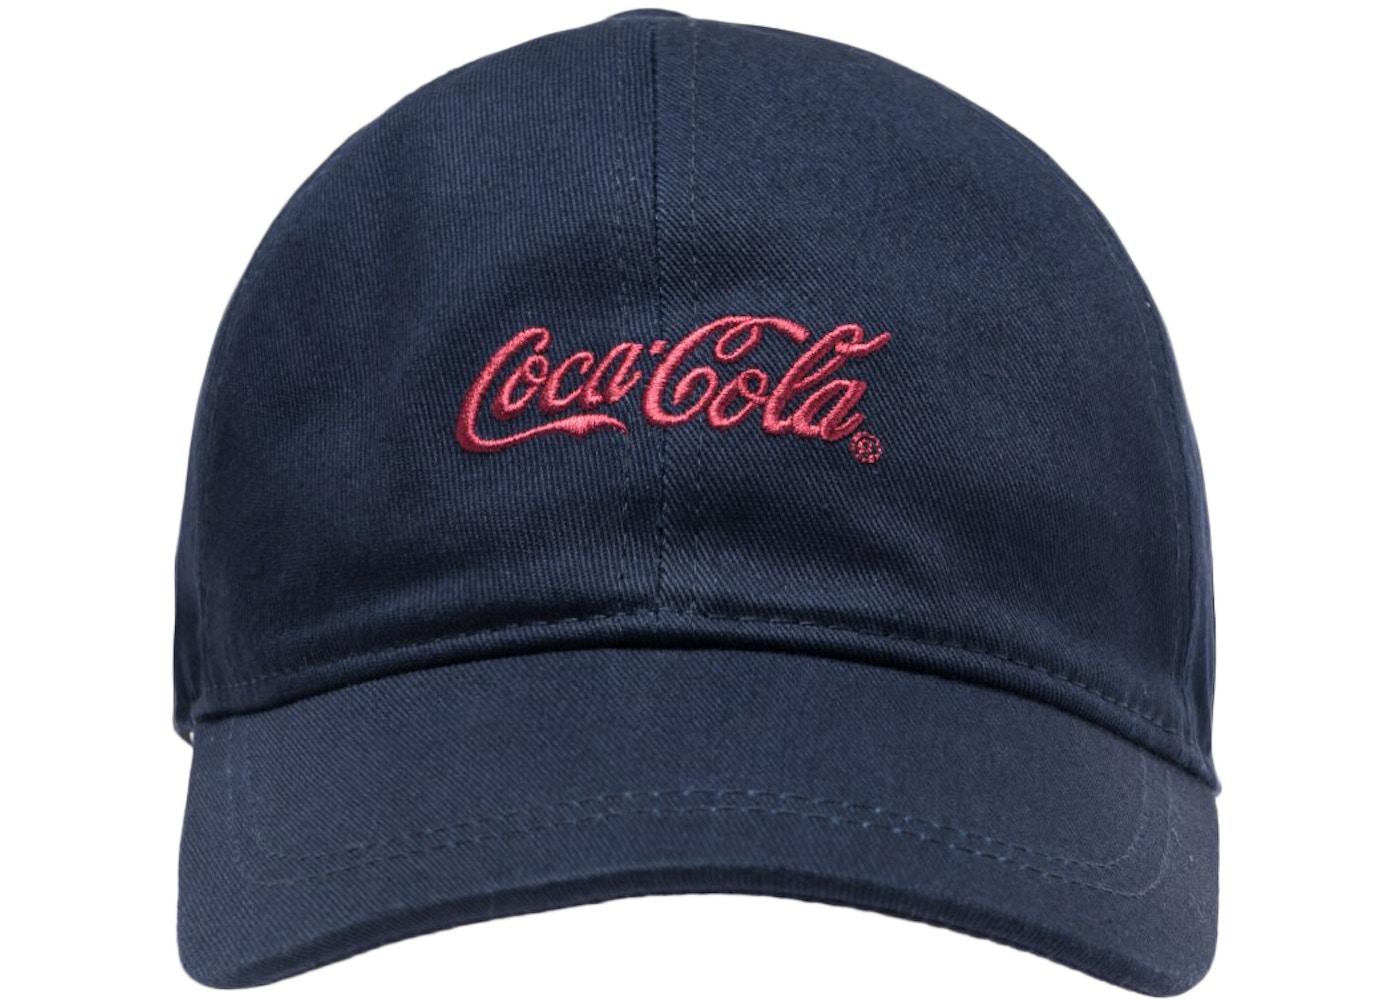 f4b0665b7a4 Kith x Coca-Cola Classic Coke Logo Cap Navy - FW18